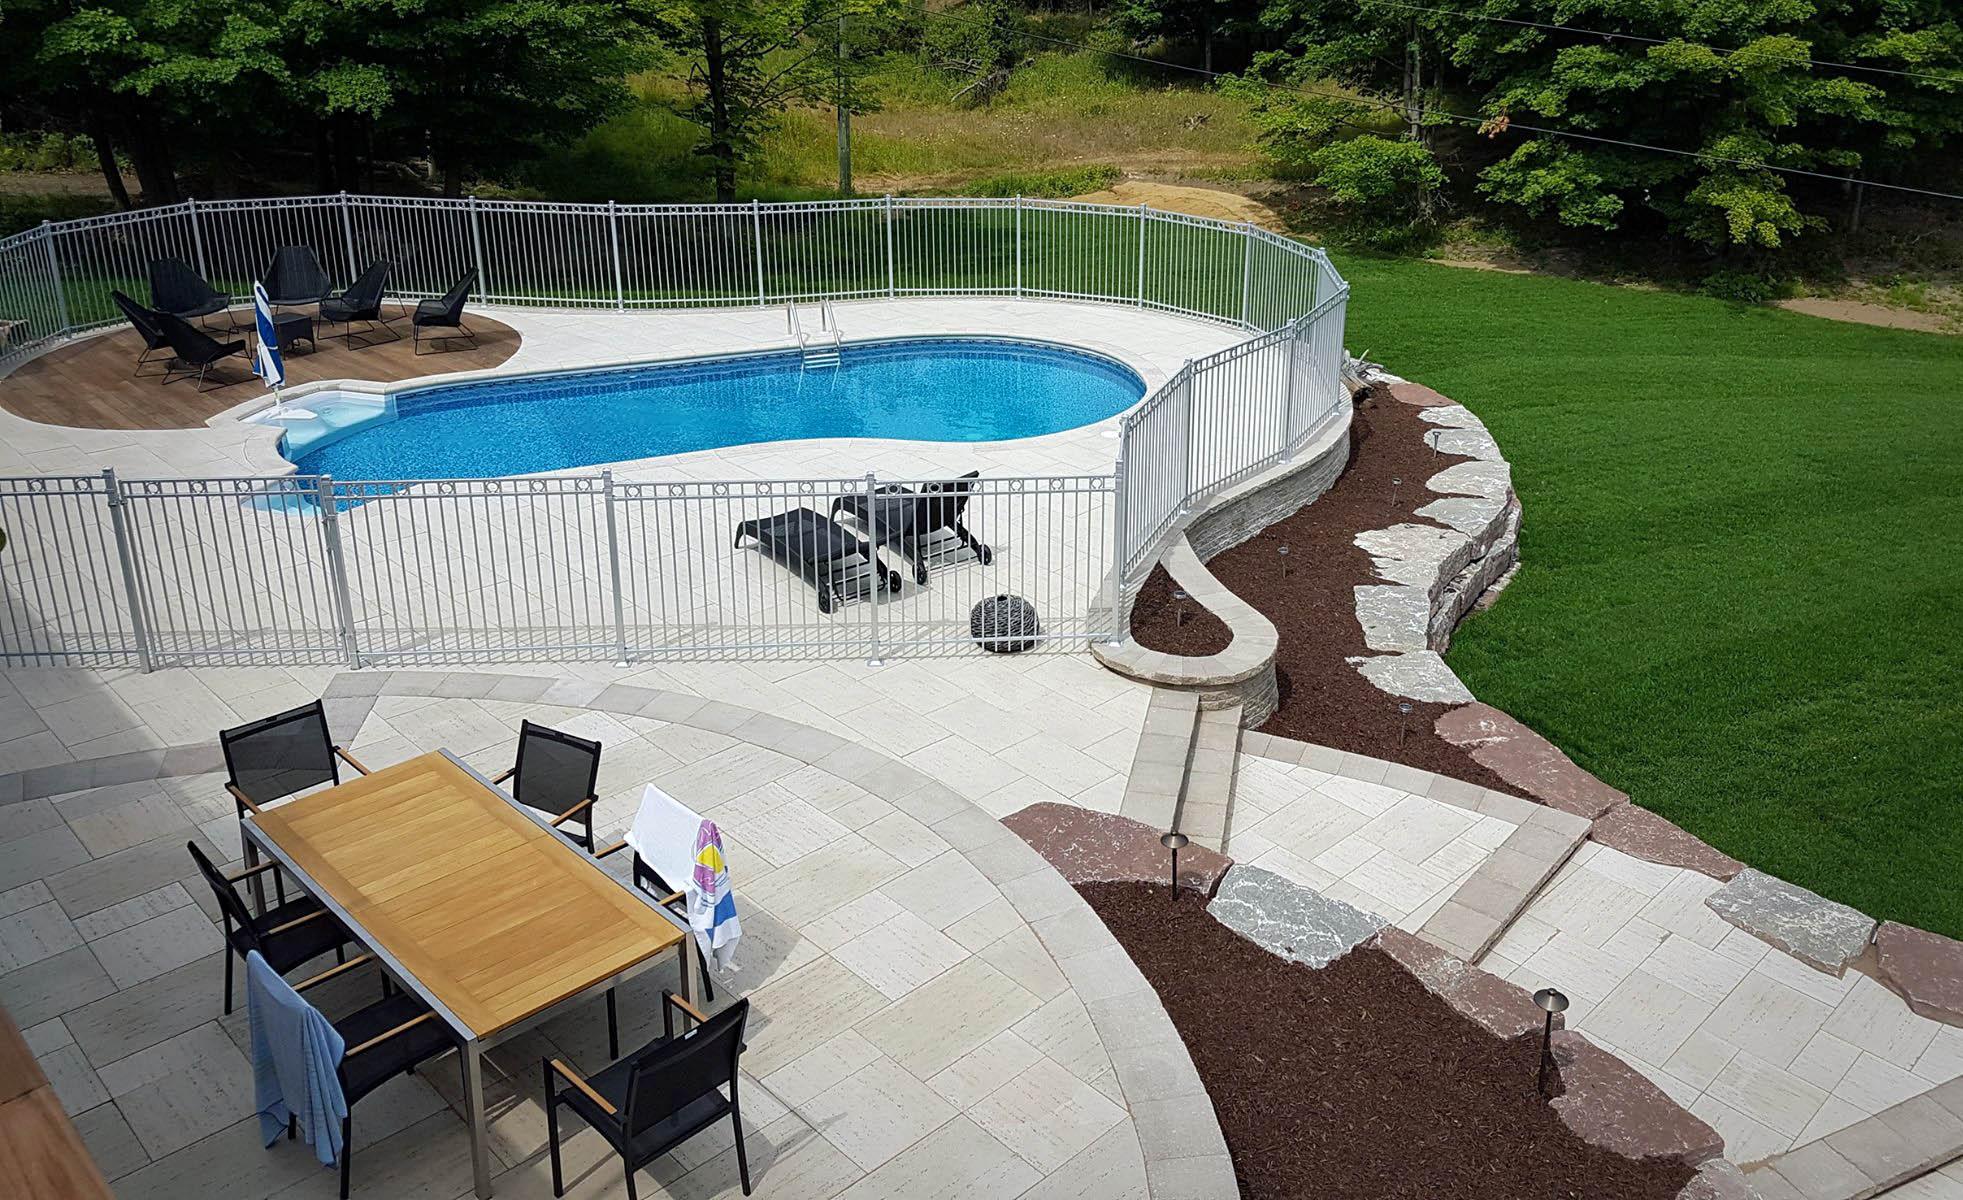 Riverview Design Solutions - Landscape Architecture - Thousand Islands - Pool Patio Space.jpg